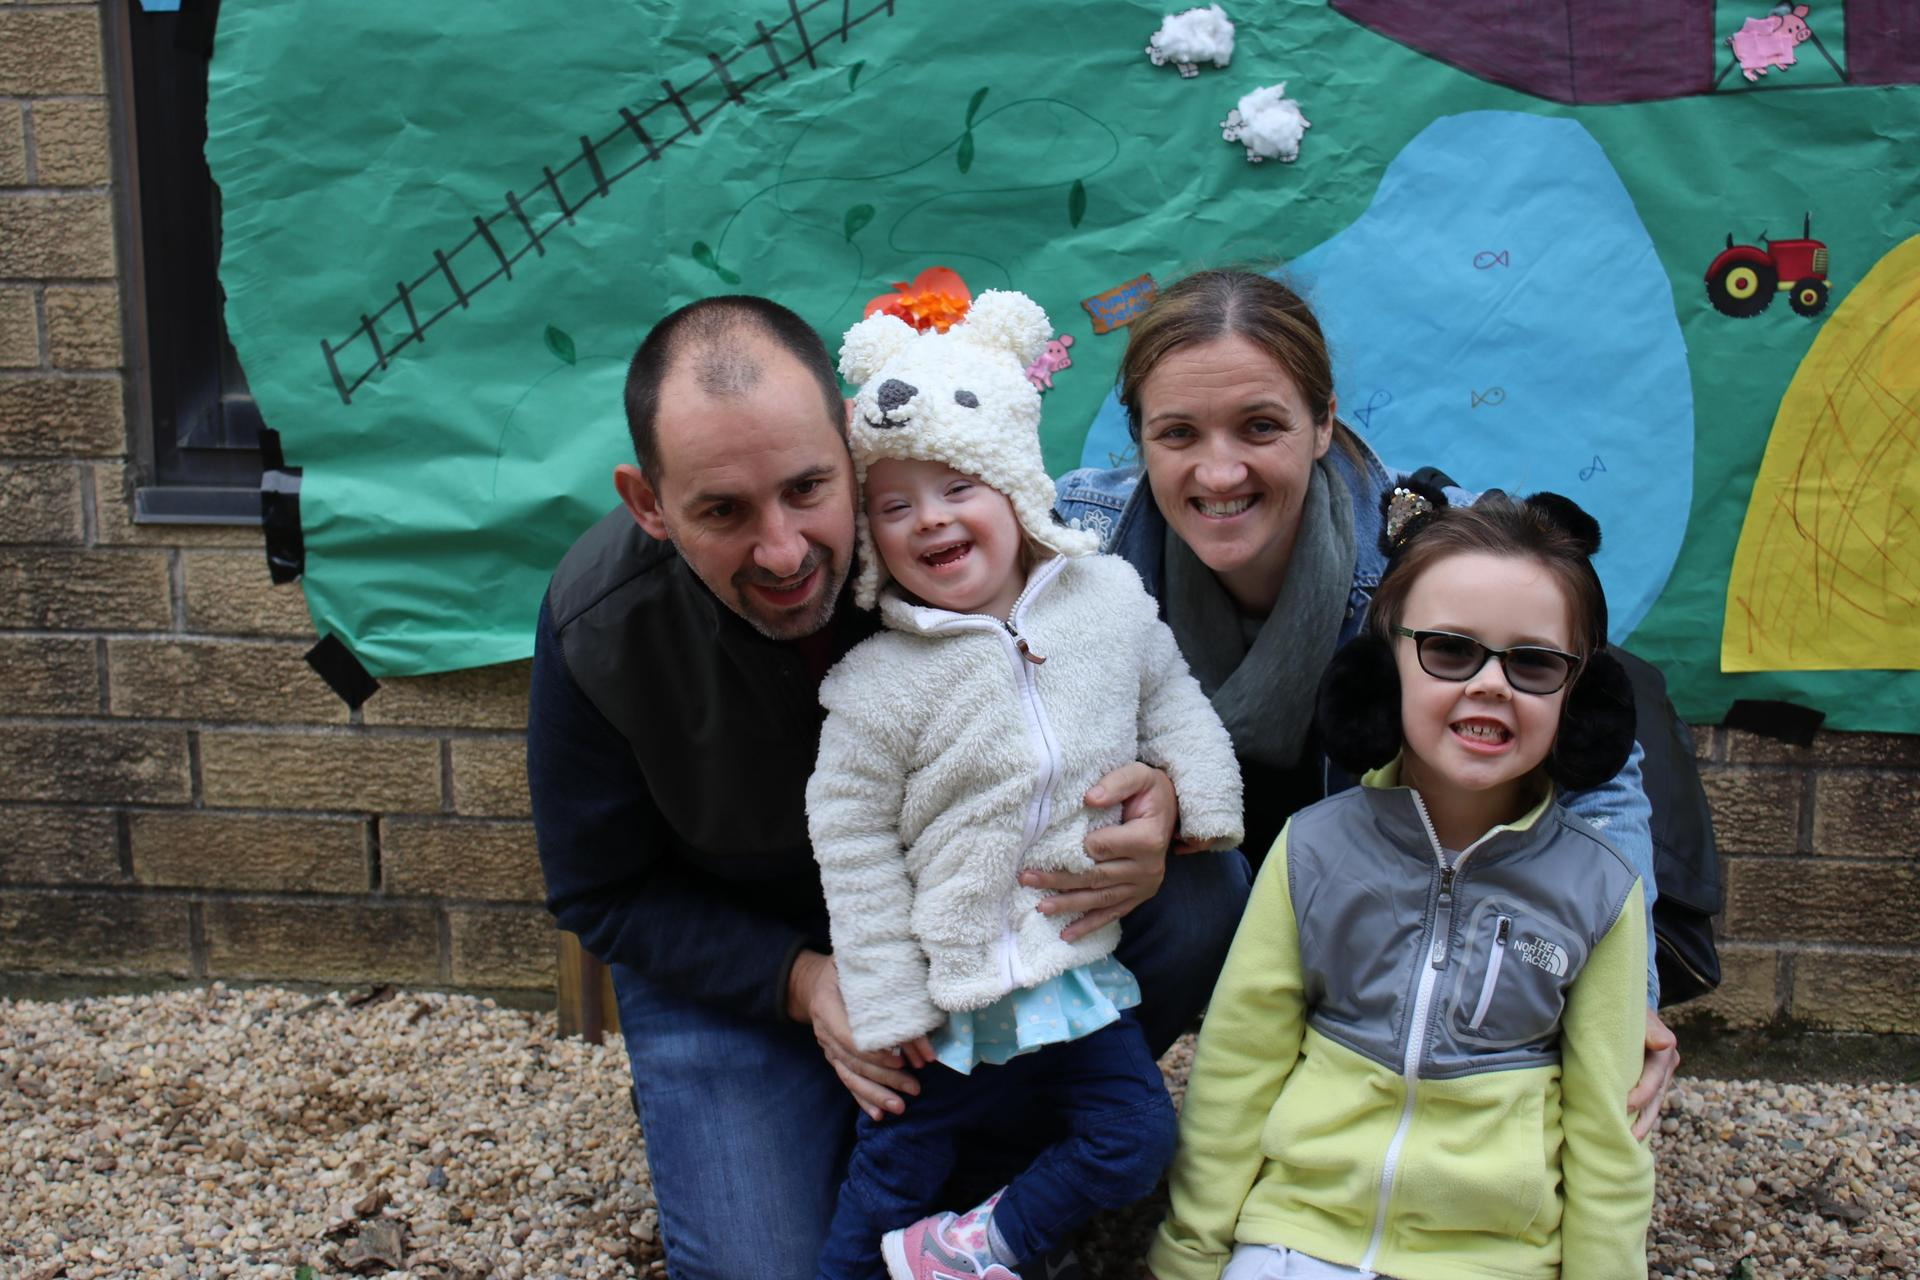 Family photo from Medford